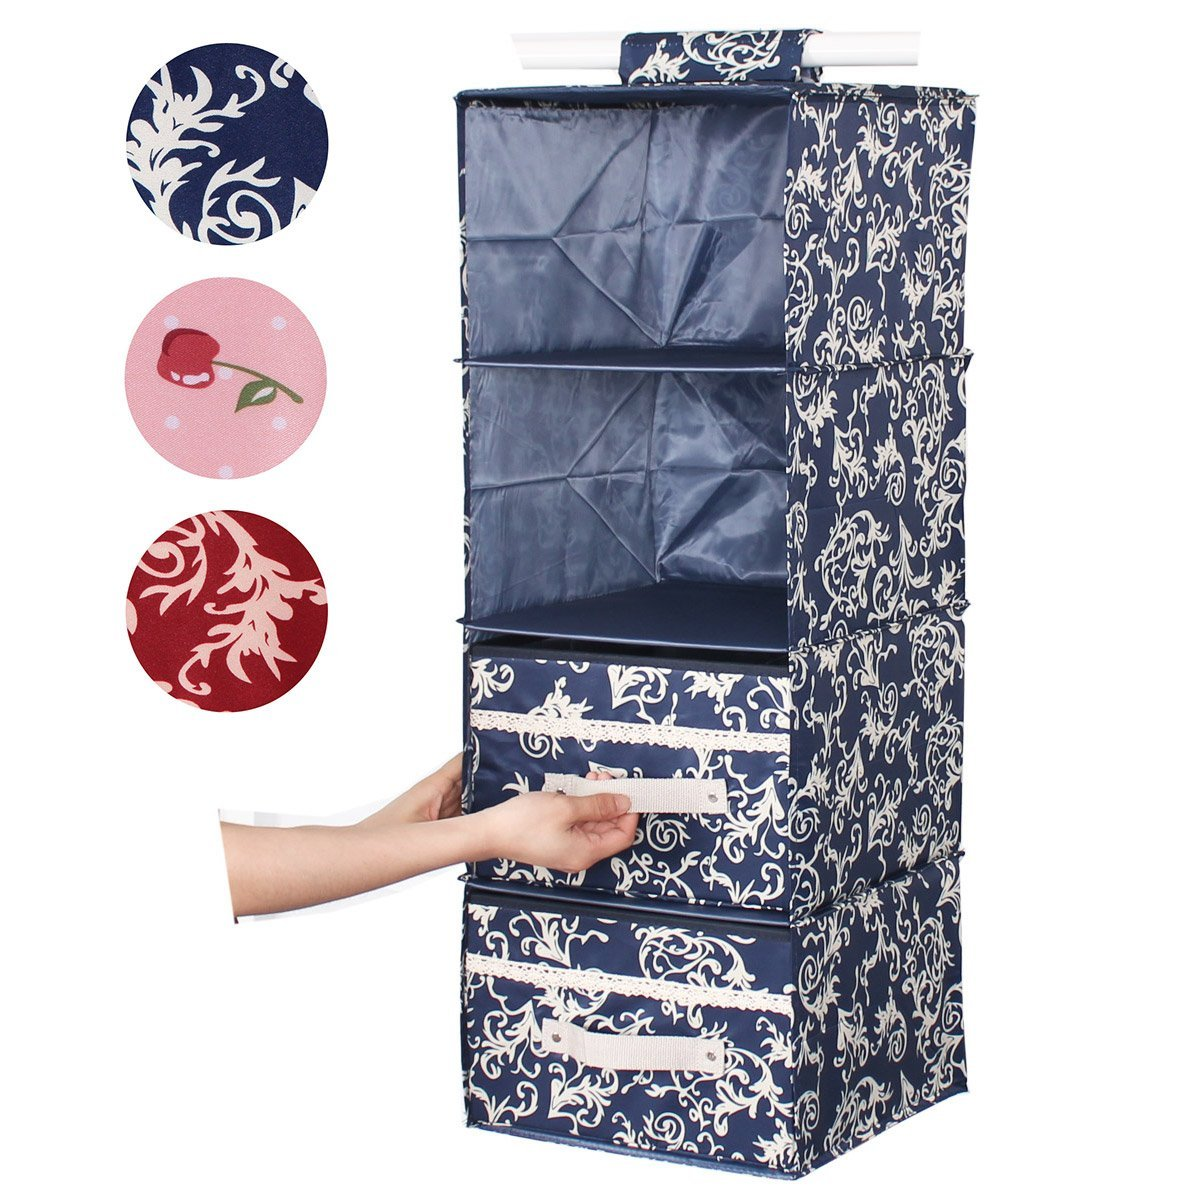 20pcs Dust Cover Garment Storage Organizer Bag Wardrobe-Hanging-Clothing-Bag.UK